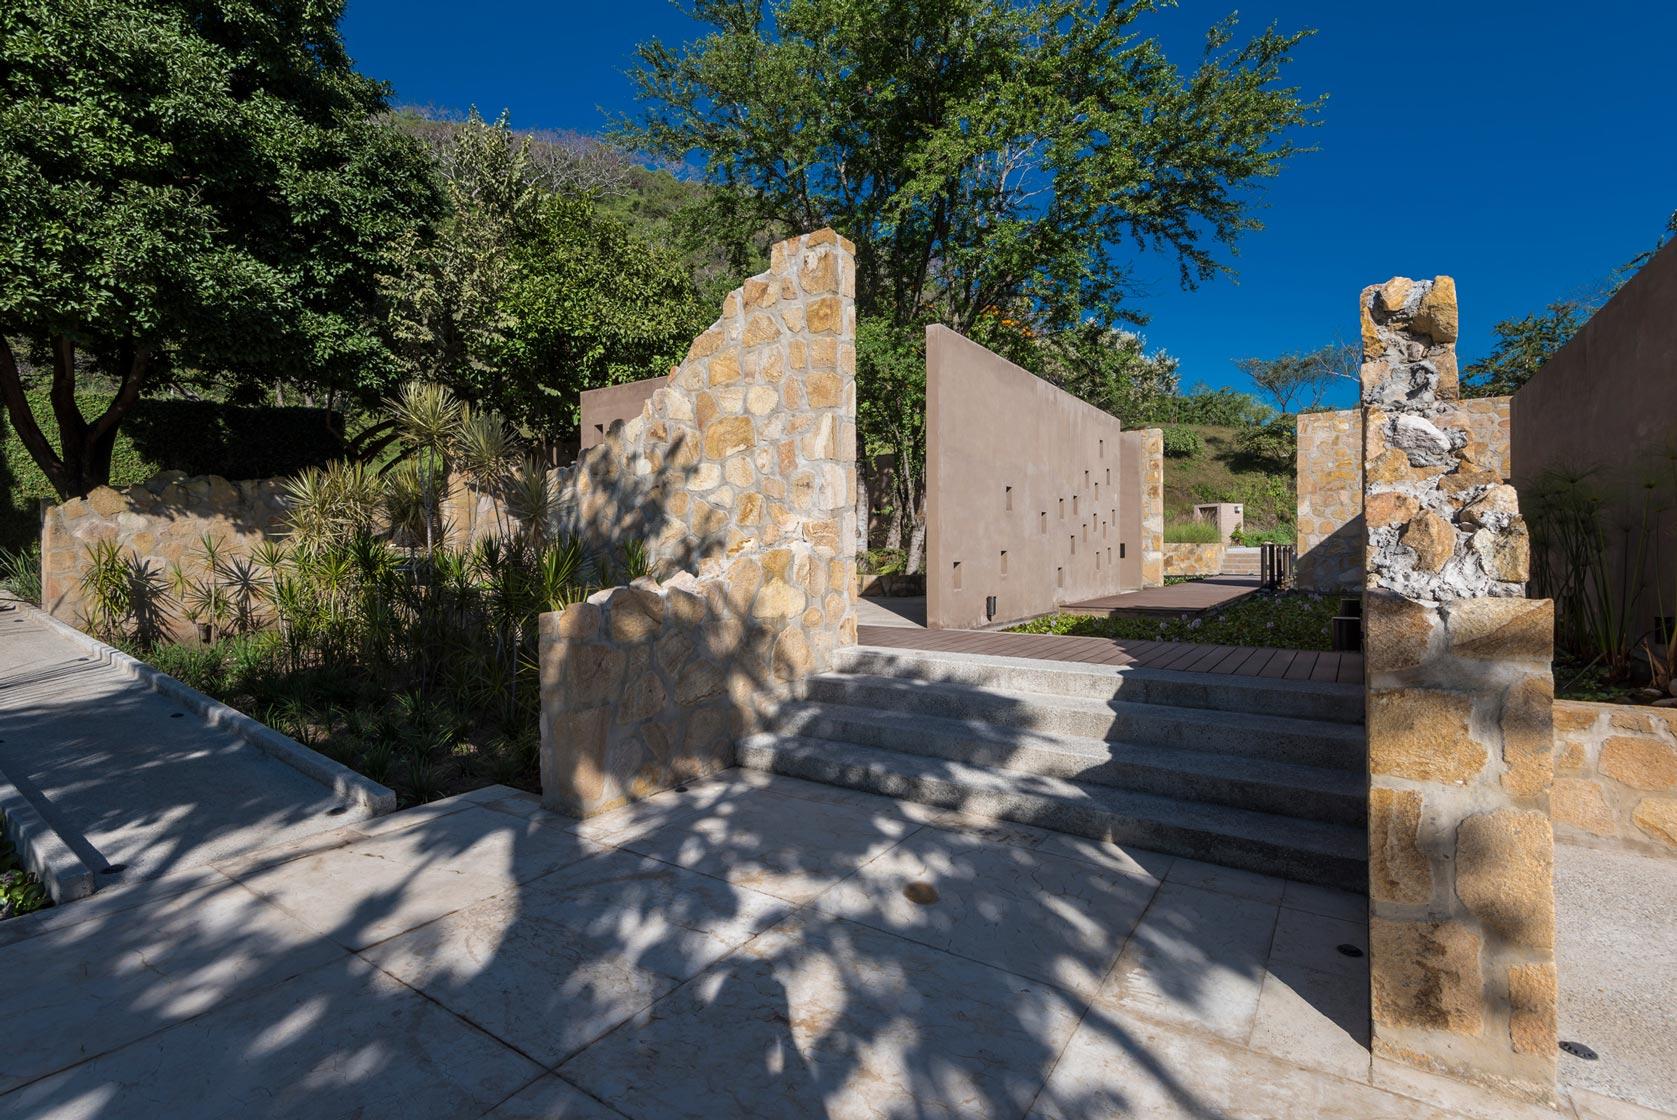 jardín agua viva, jardines para boda en morelos, jardines para boda en méxico - Wedding Hub - 011